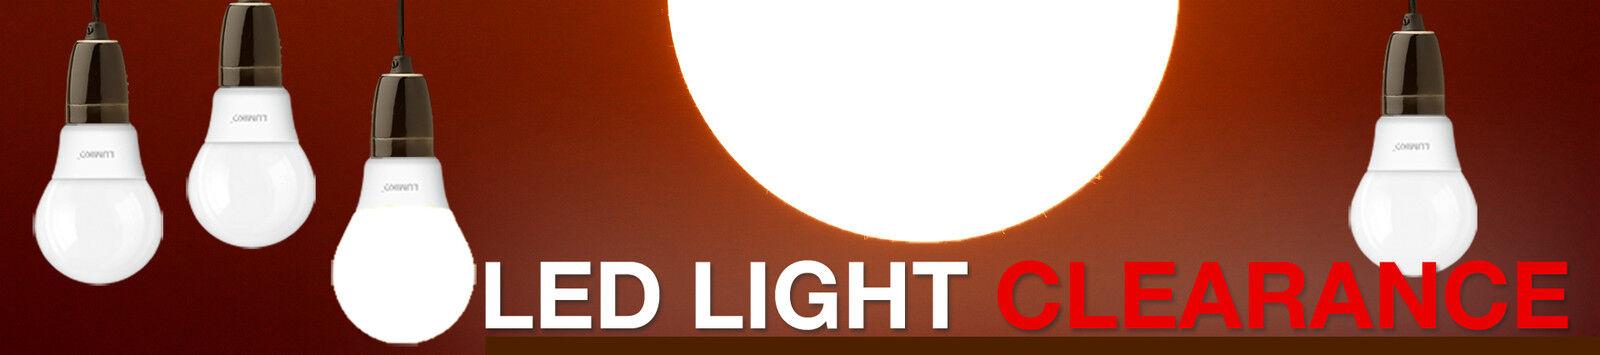 ledlightclearance446